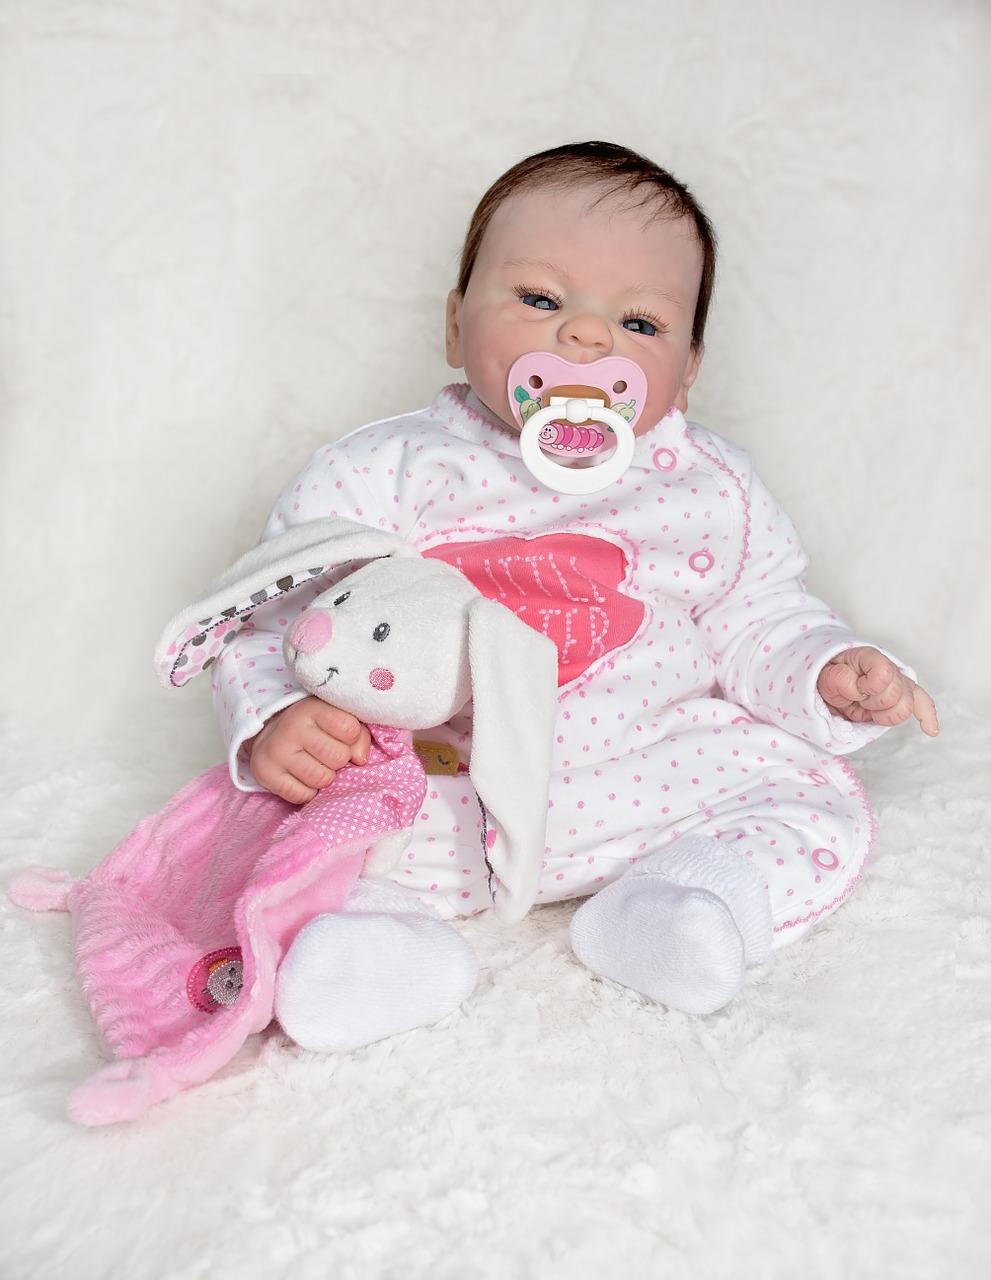 Ce bébé reborn a un doudou lapin rose.